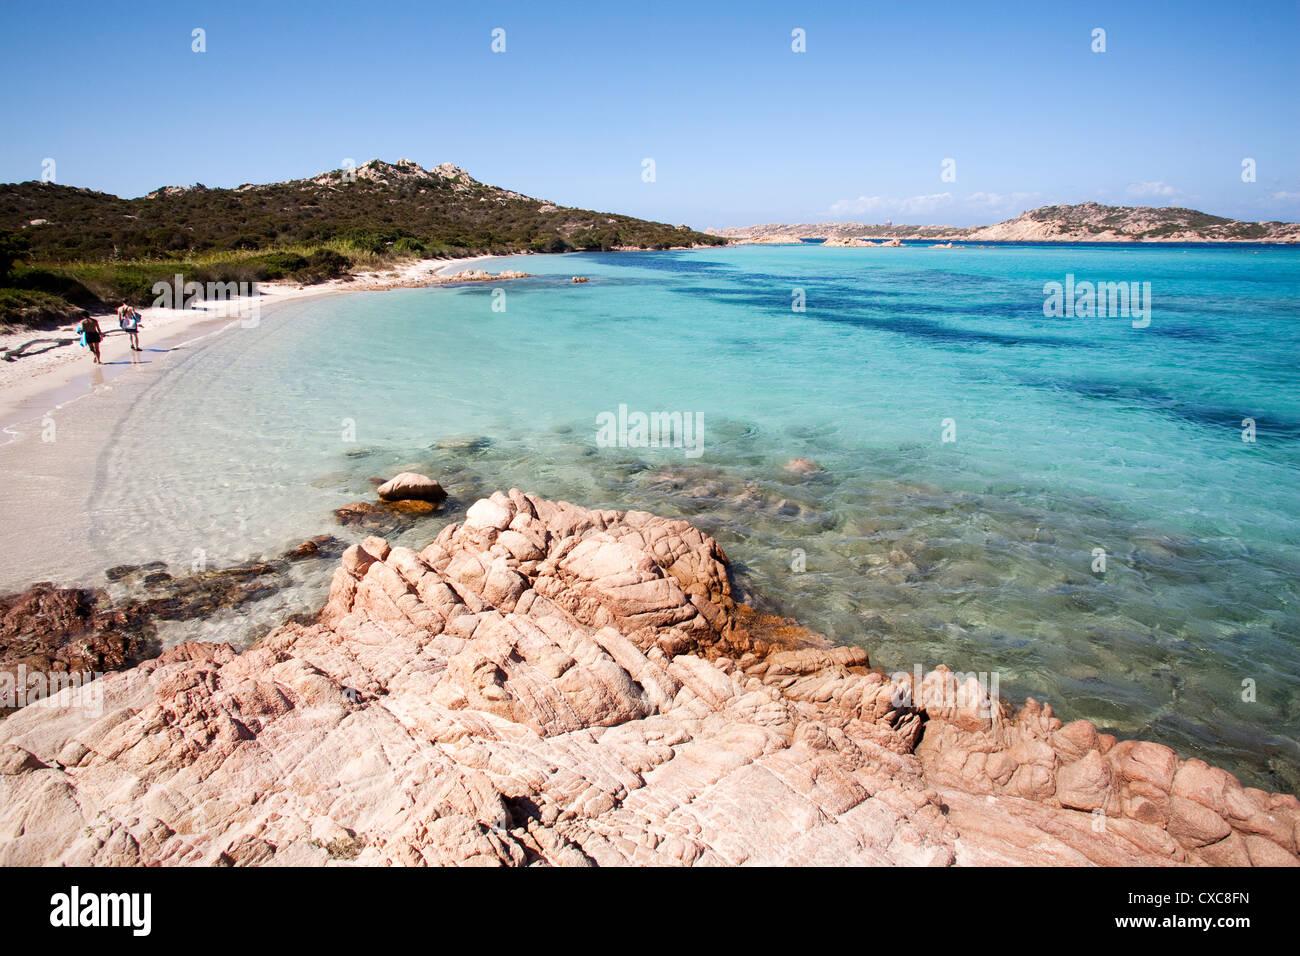 The Madonna Mantle, Maddalena Islands, La Maddalena National Park, Sardinia, Italy - Stock Image